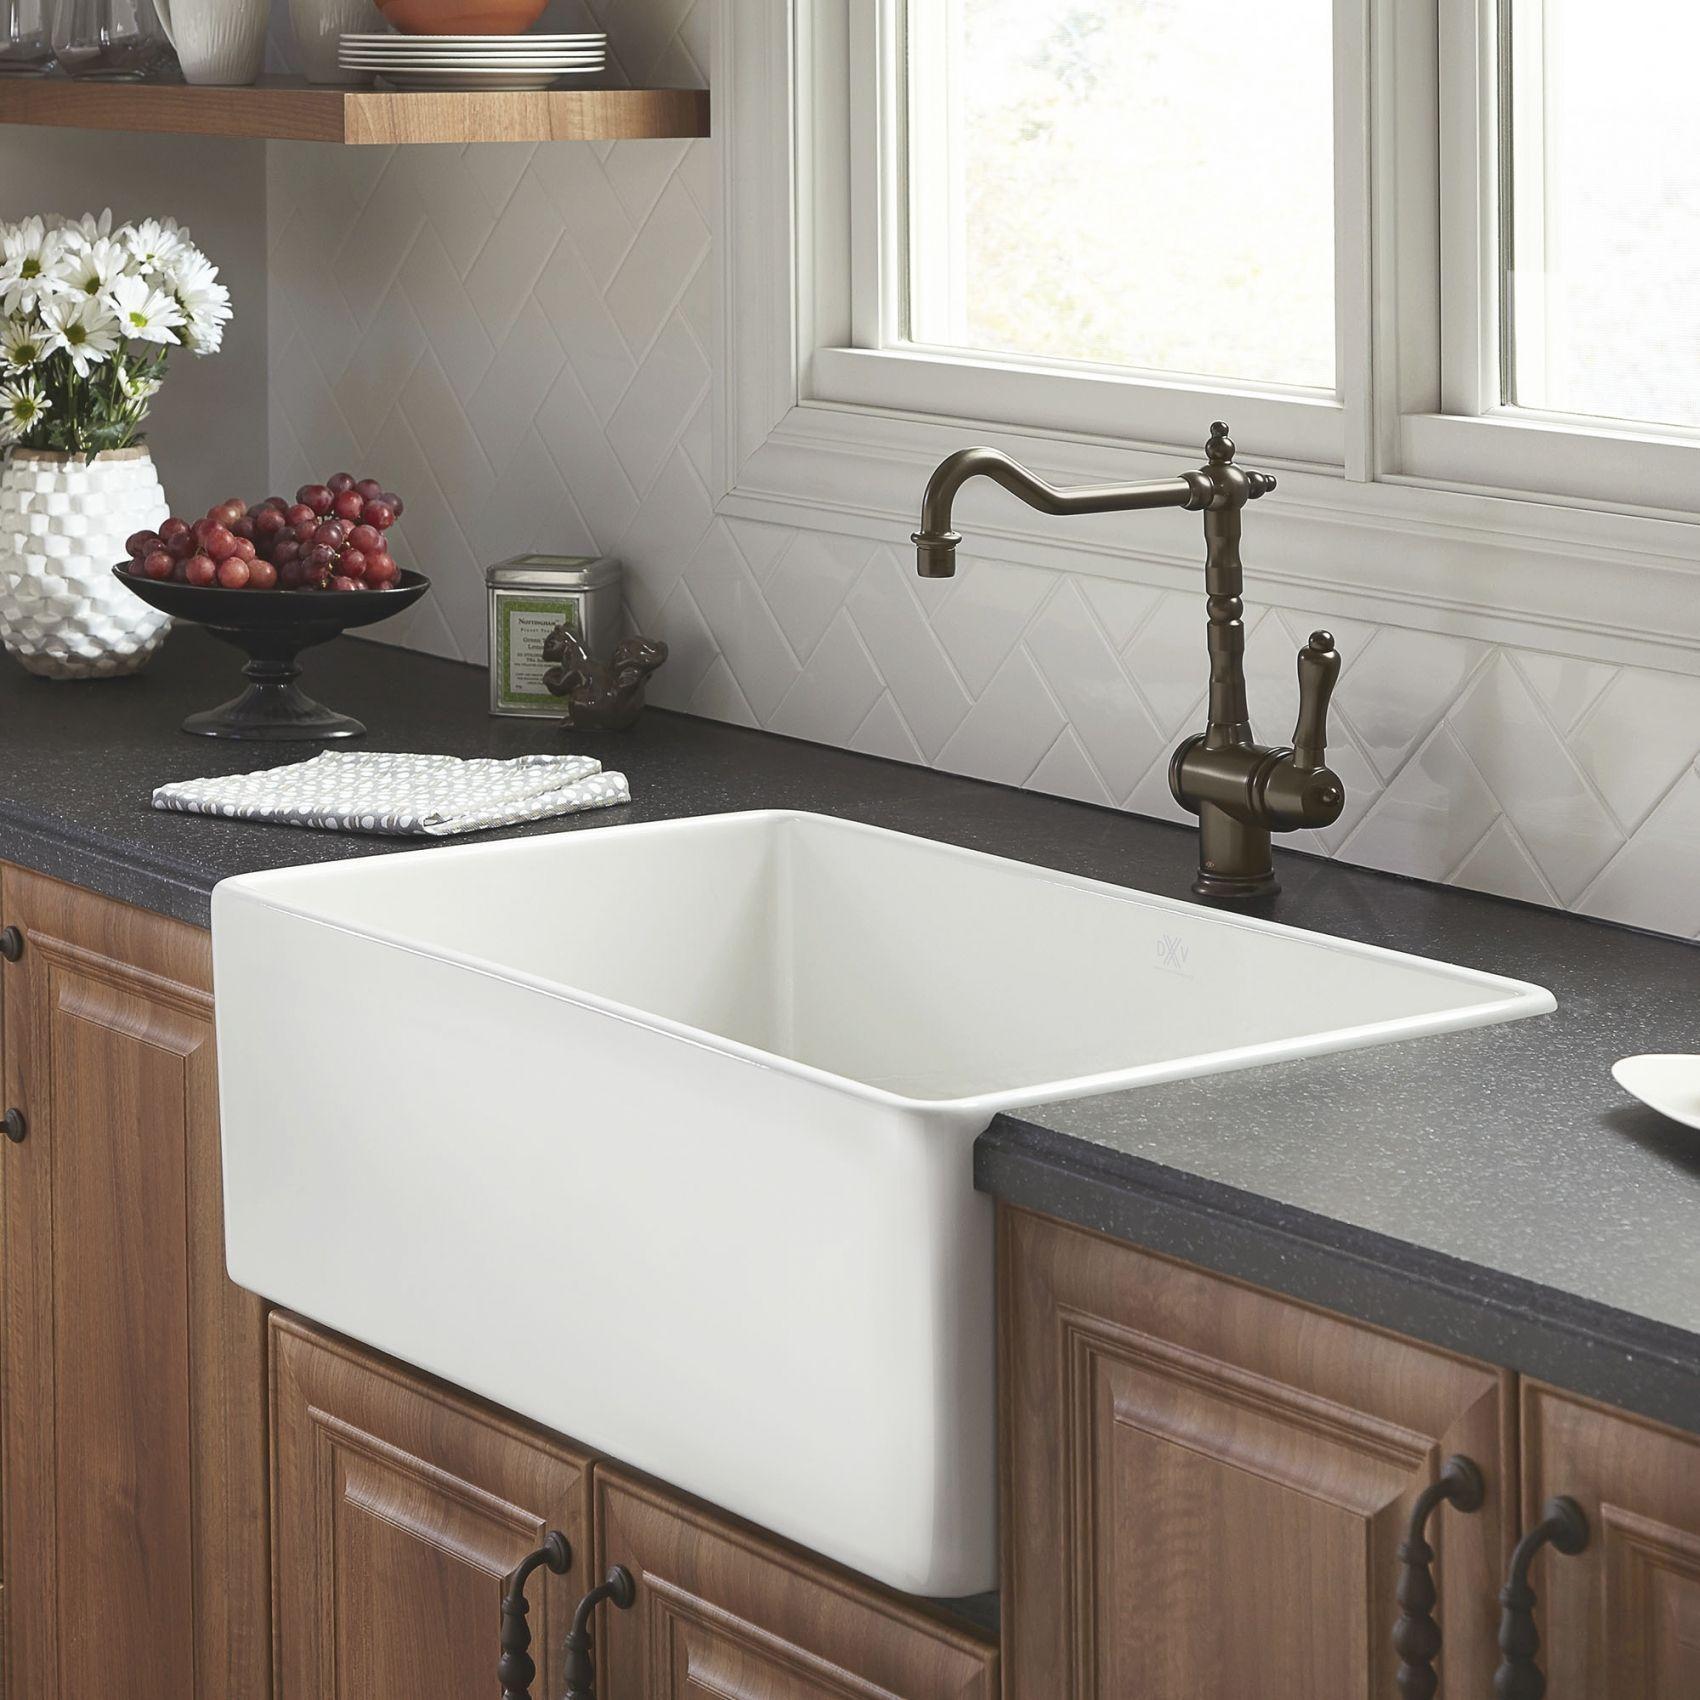 Hillside 30 Inch Apron Kitchen Sink Drop In Farmhouse Sink Apron Sink Kitchen White Kitchen Sink